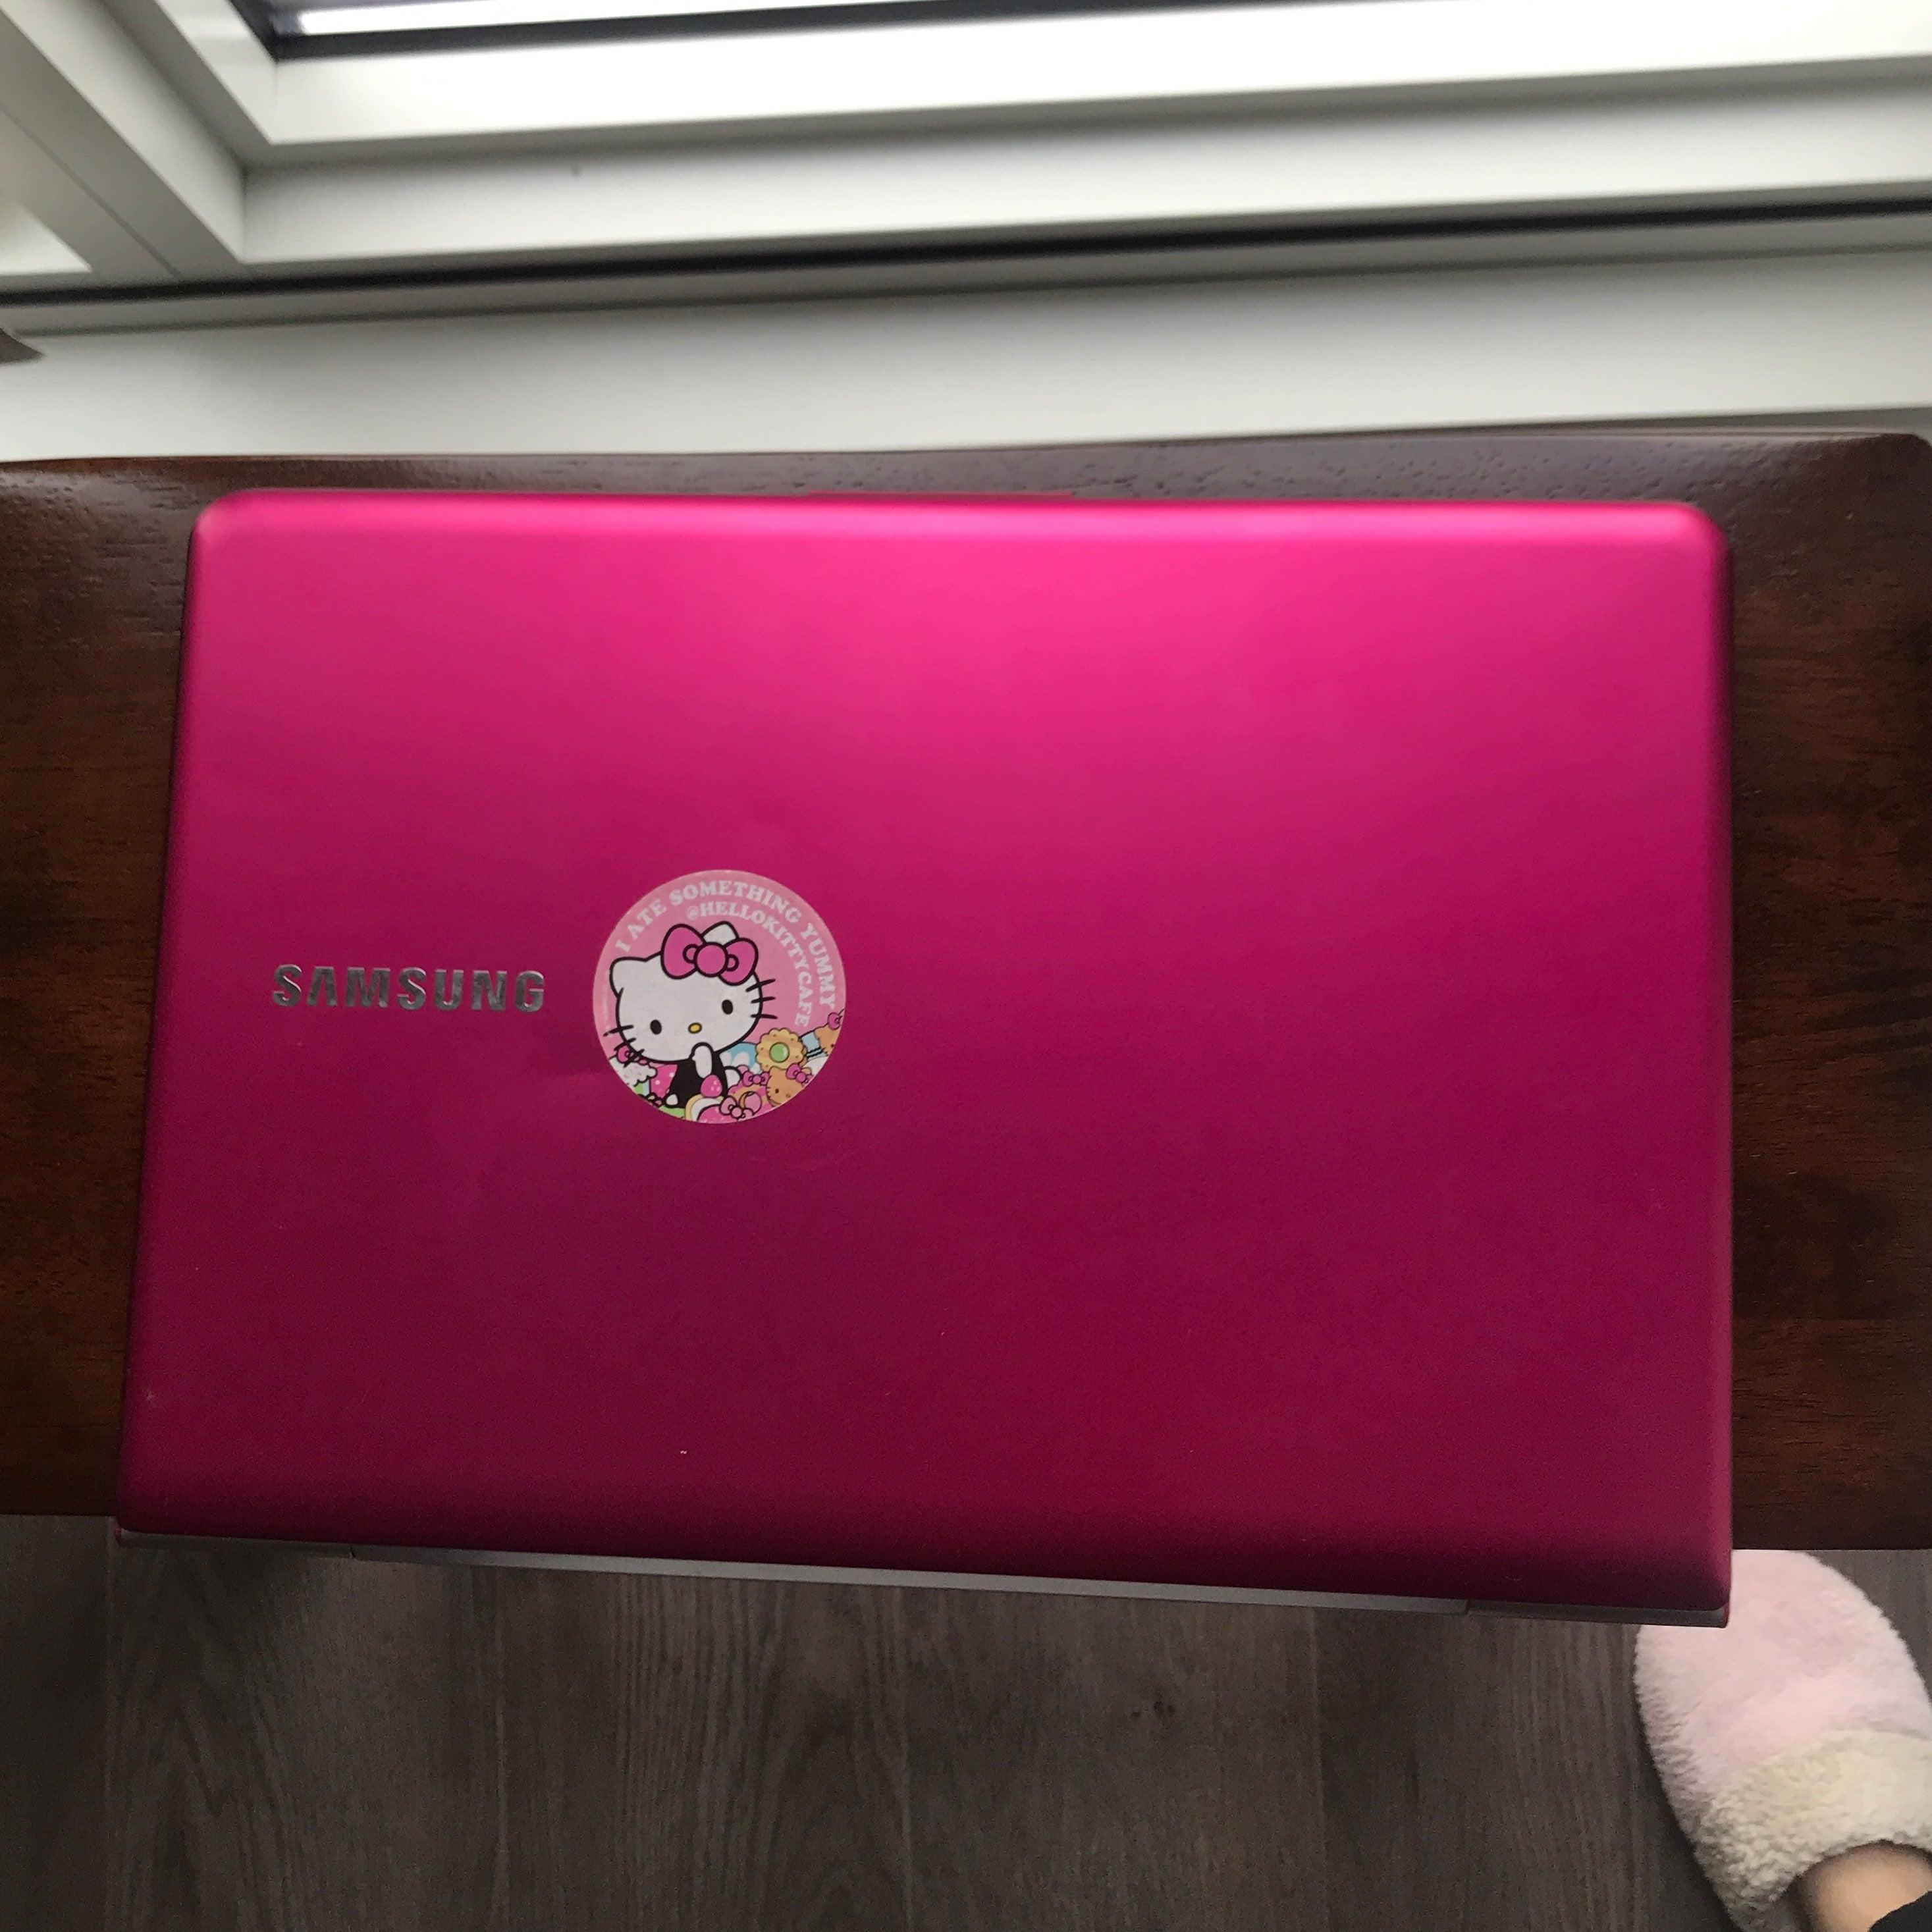 Samsung Laptop Series 5